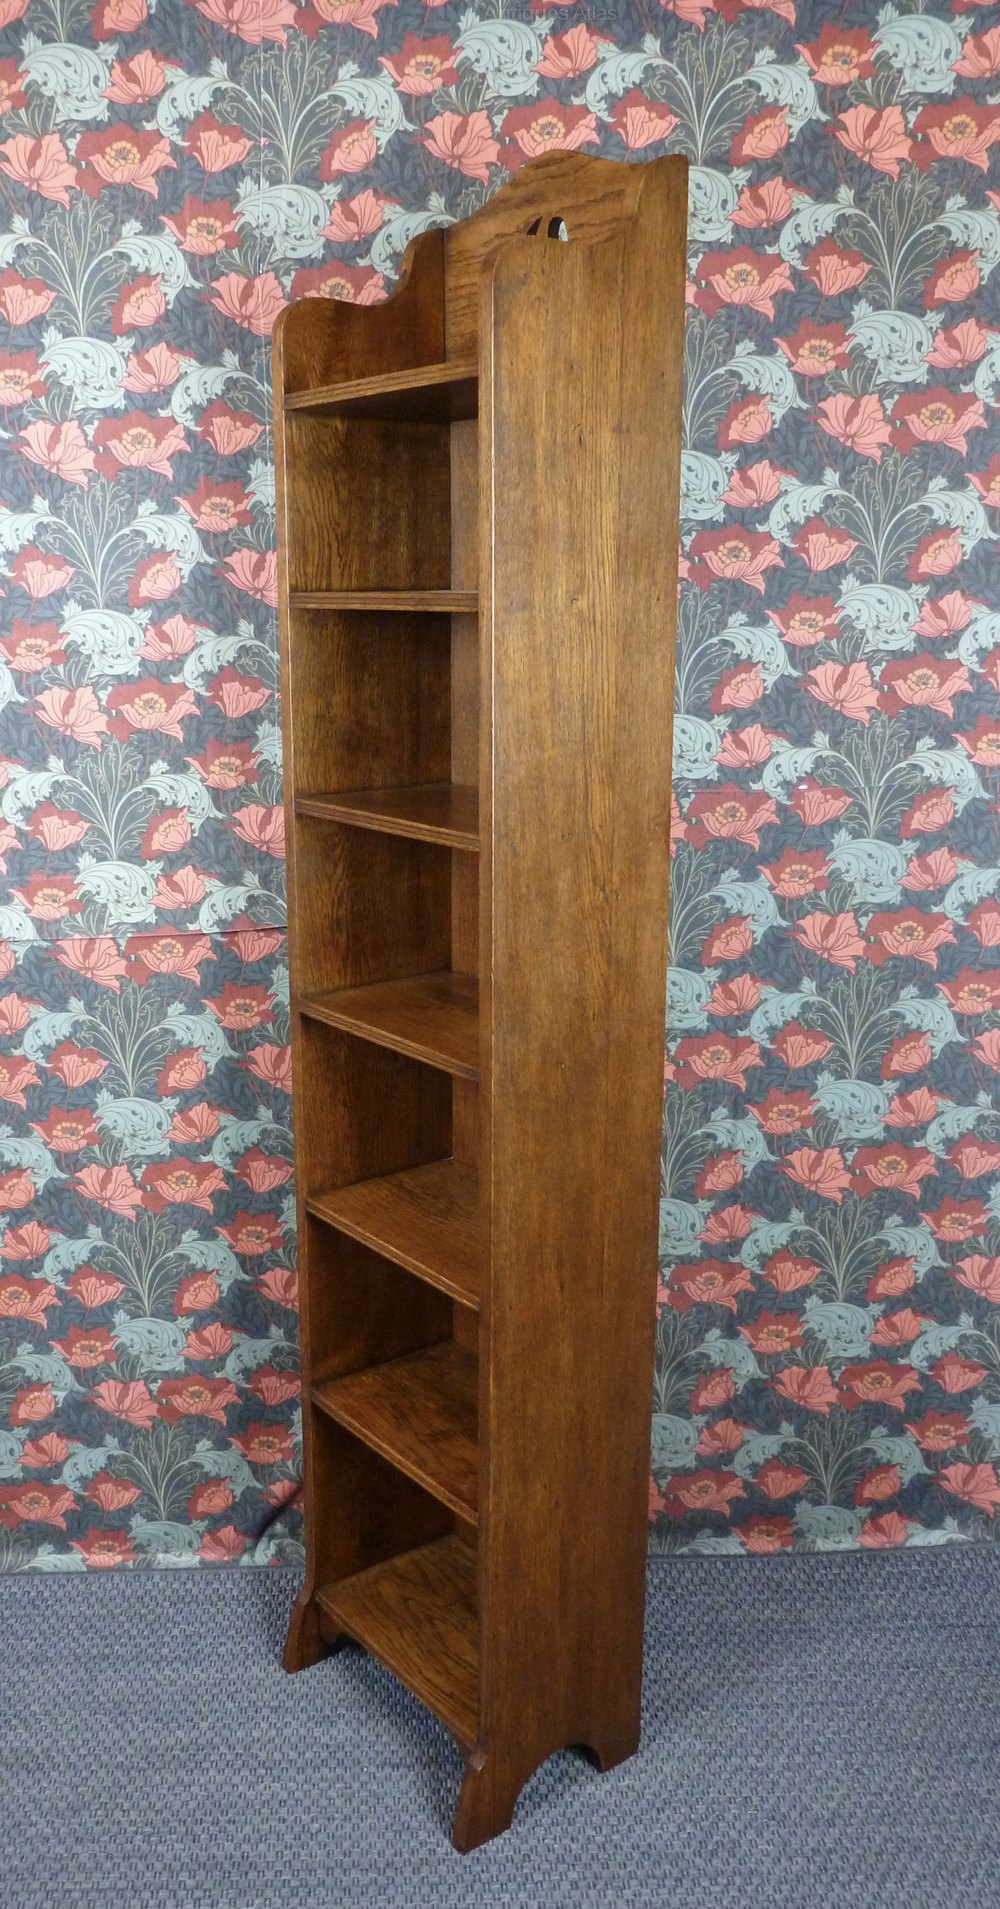 Best Very Tall Arts & Crafts Narrow Oak Bookcase C1910 - Antiques Atlas GZ34